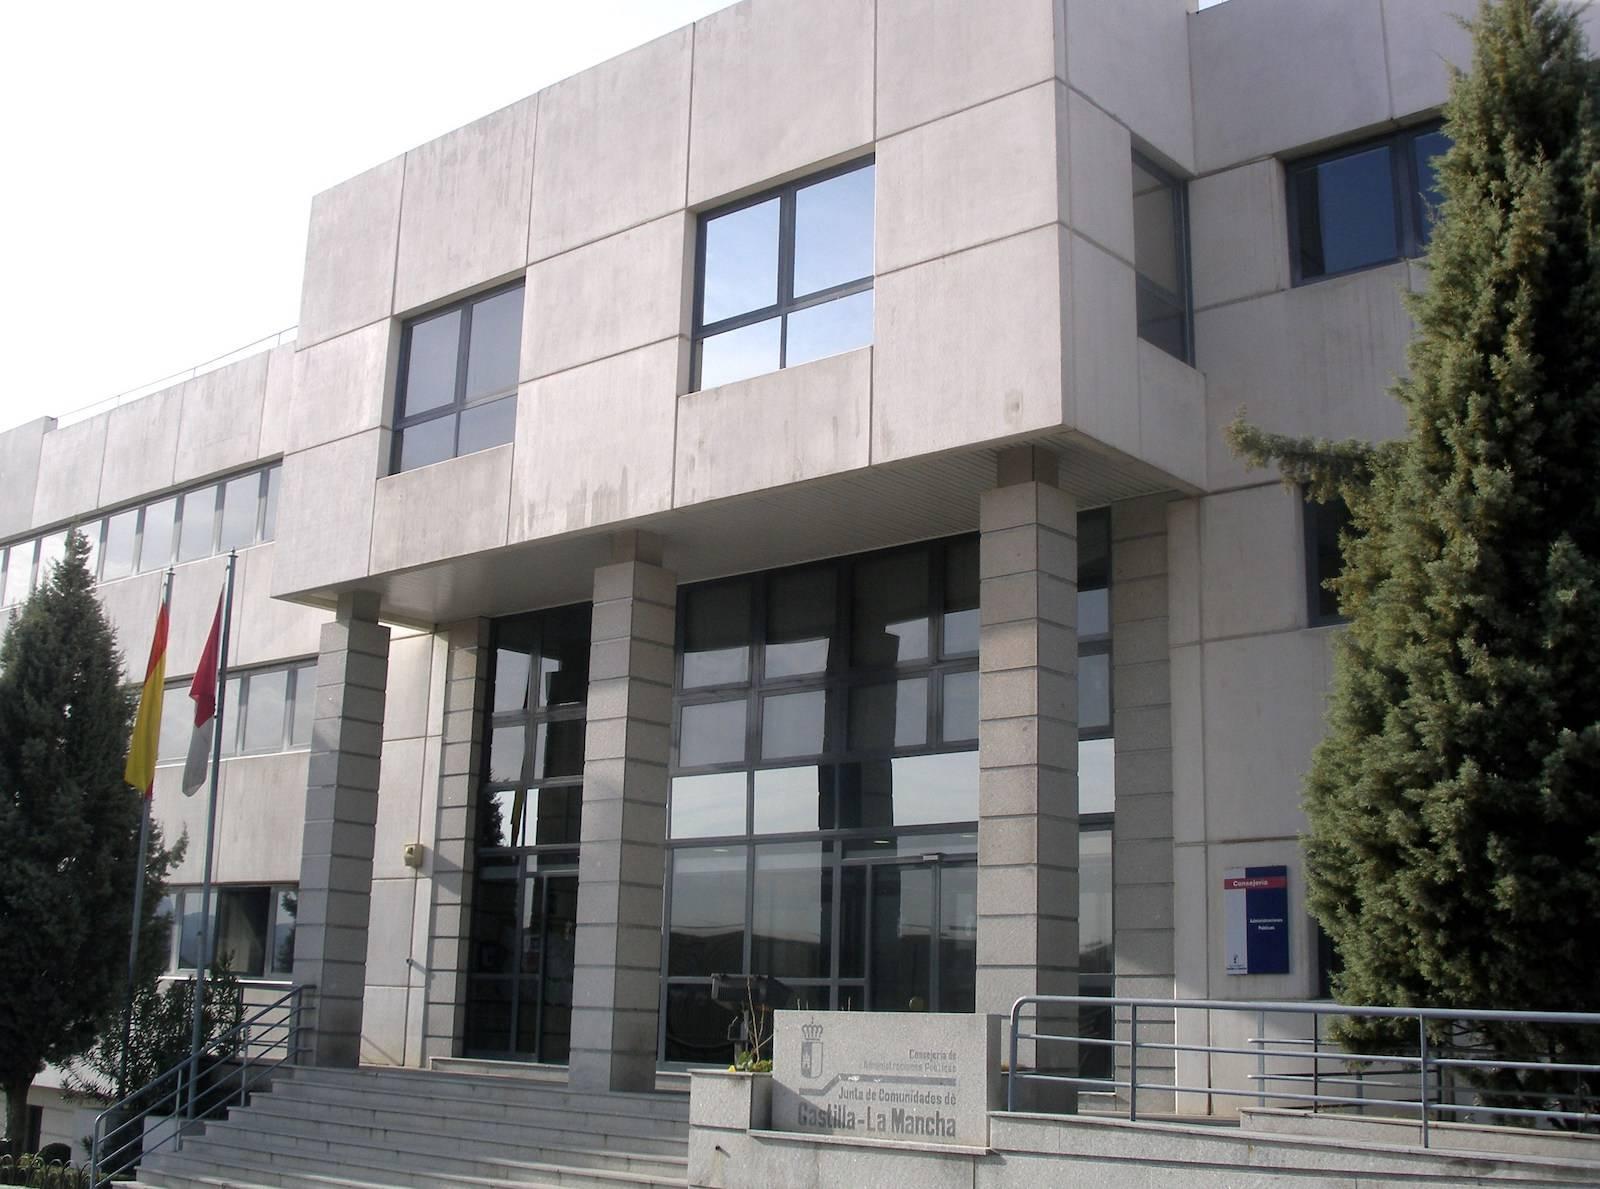 administraciones-publicas-castilla-la-mancha